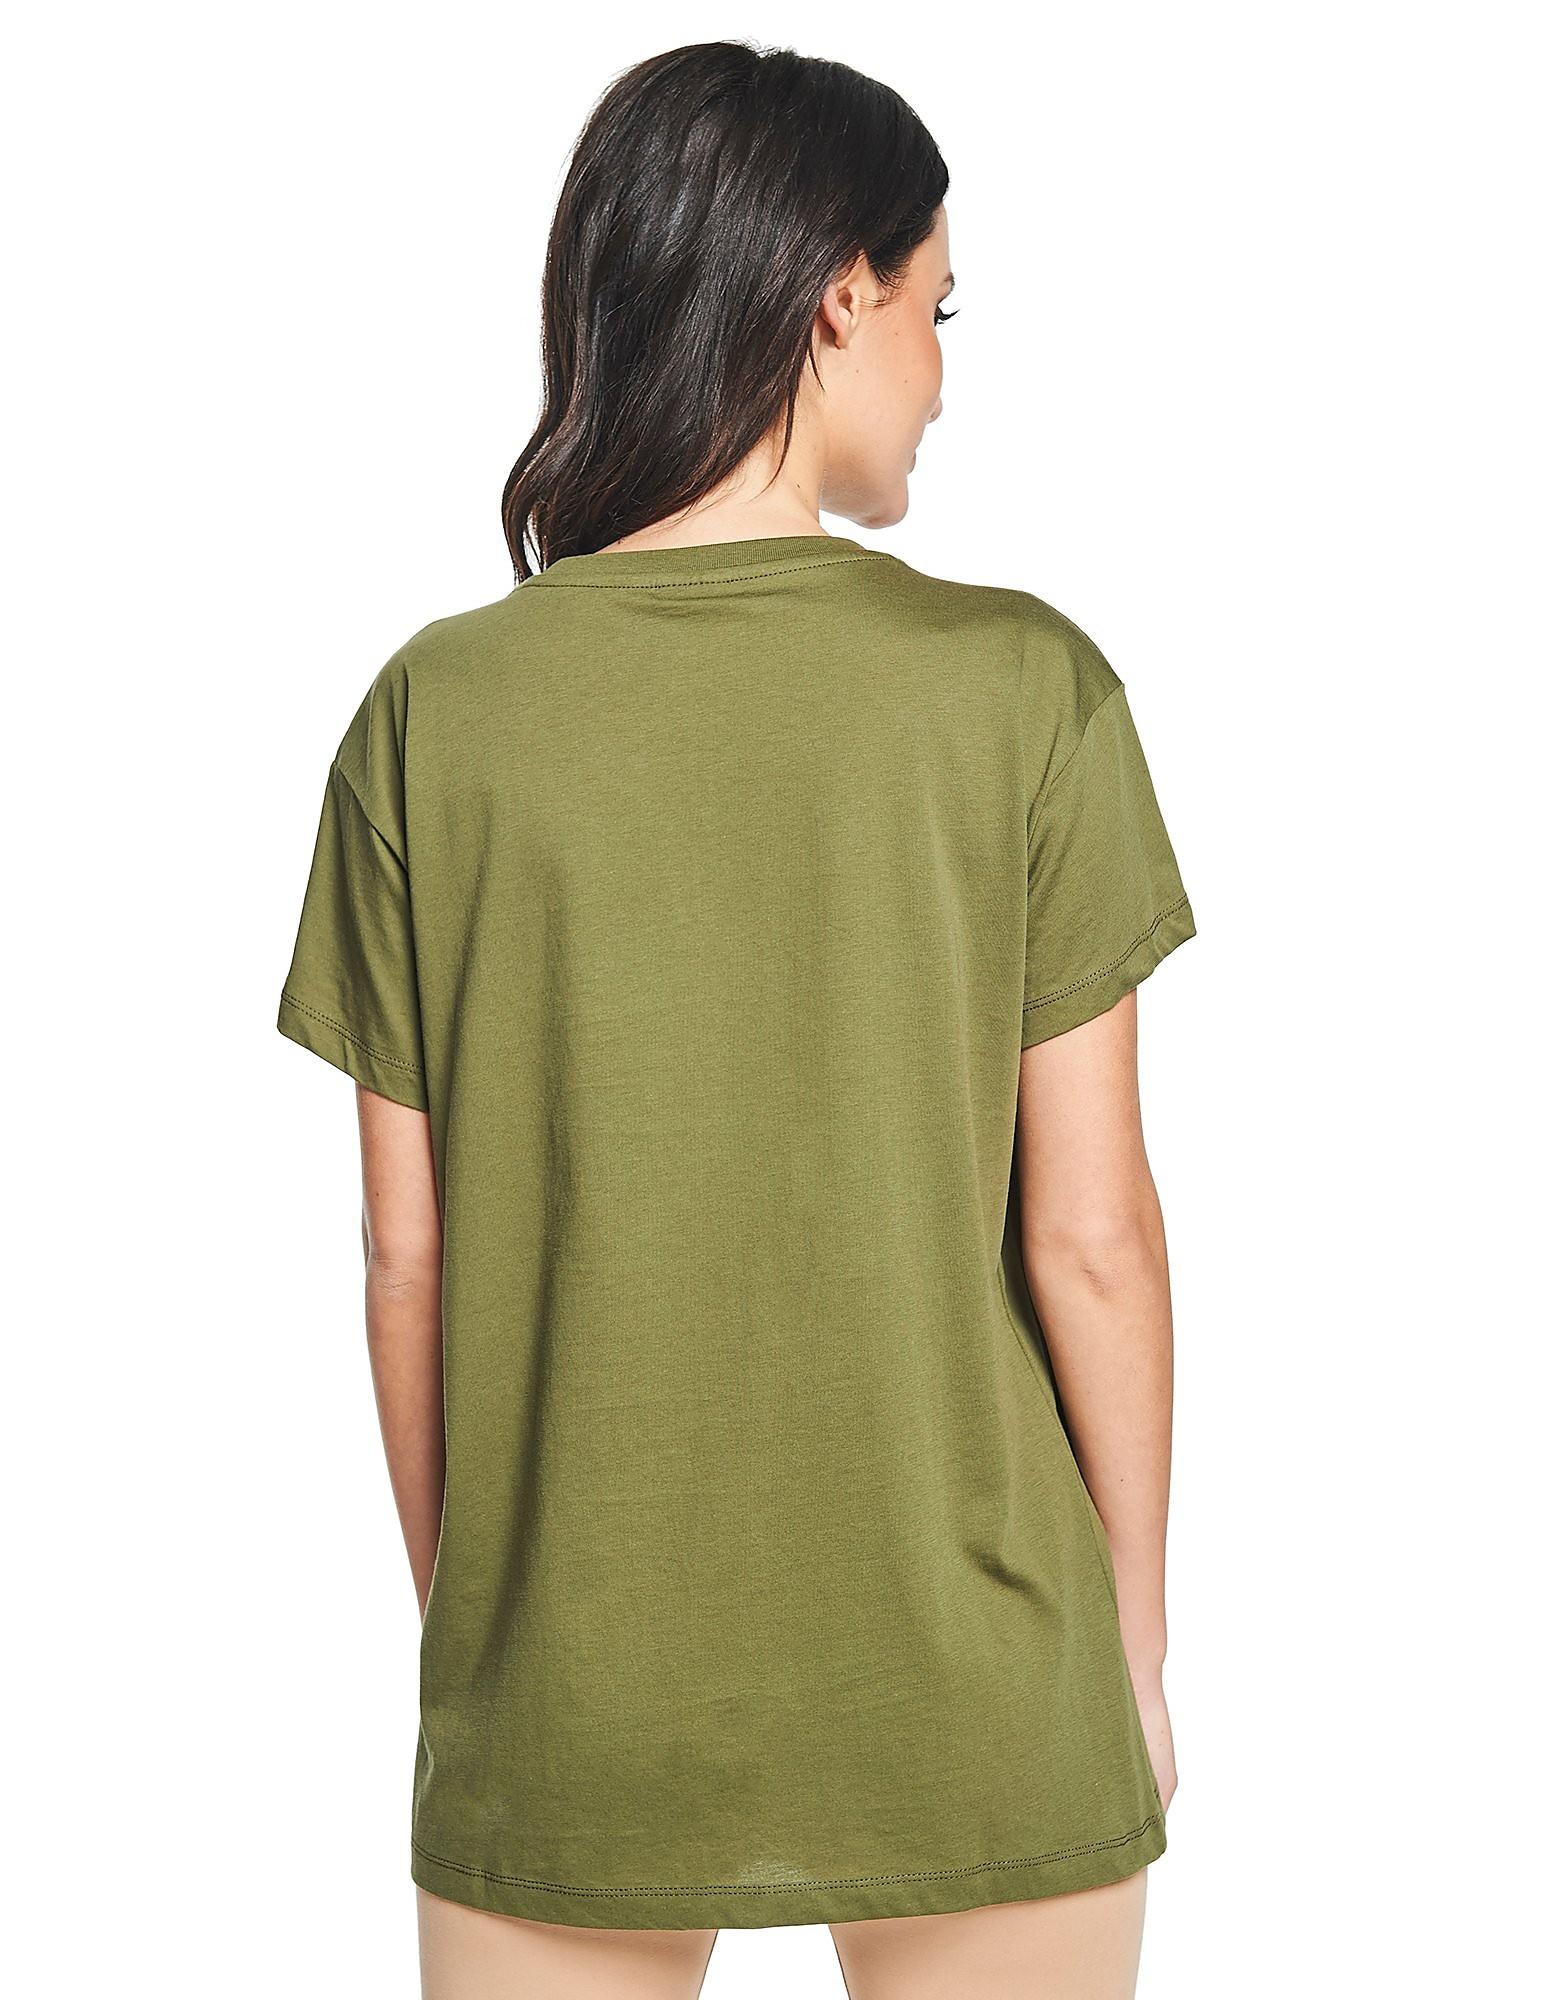 PUMA Embossed Boyfriend T-Shirt